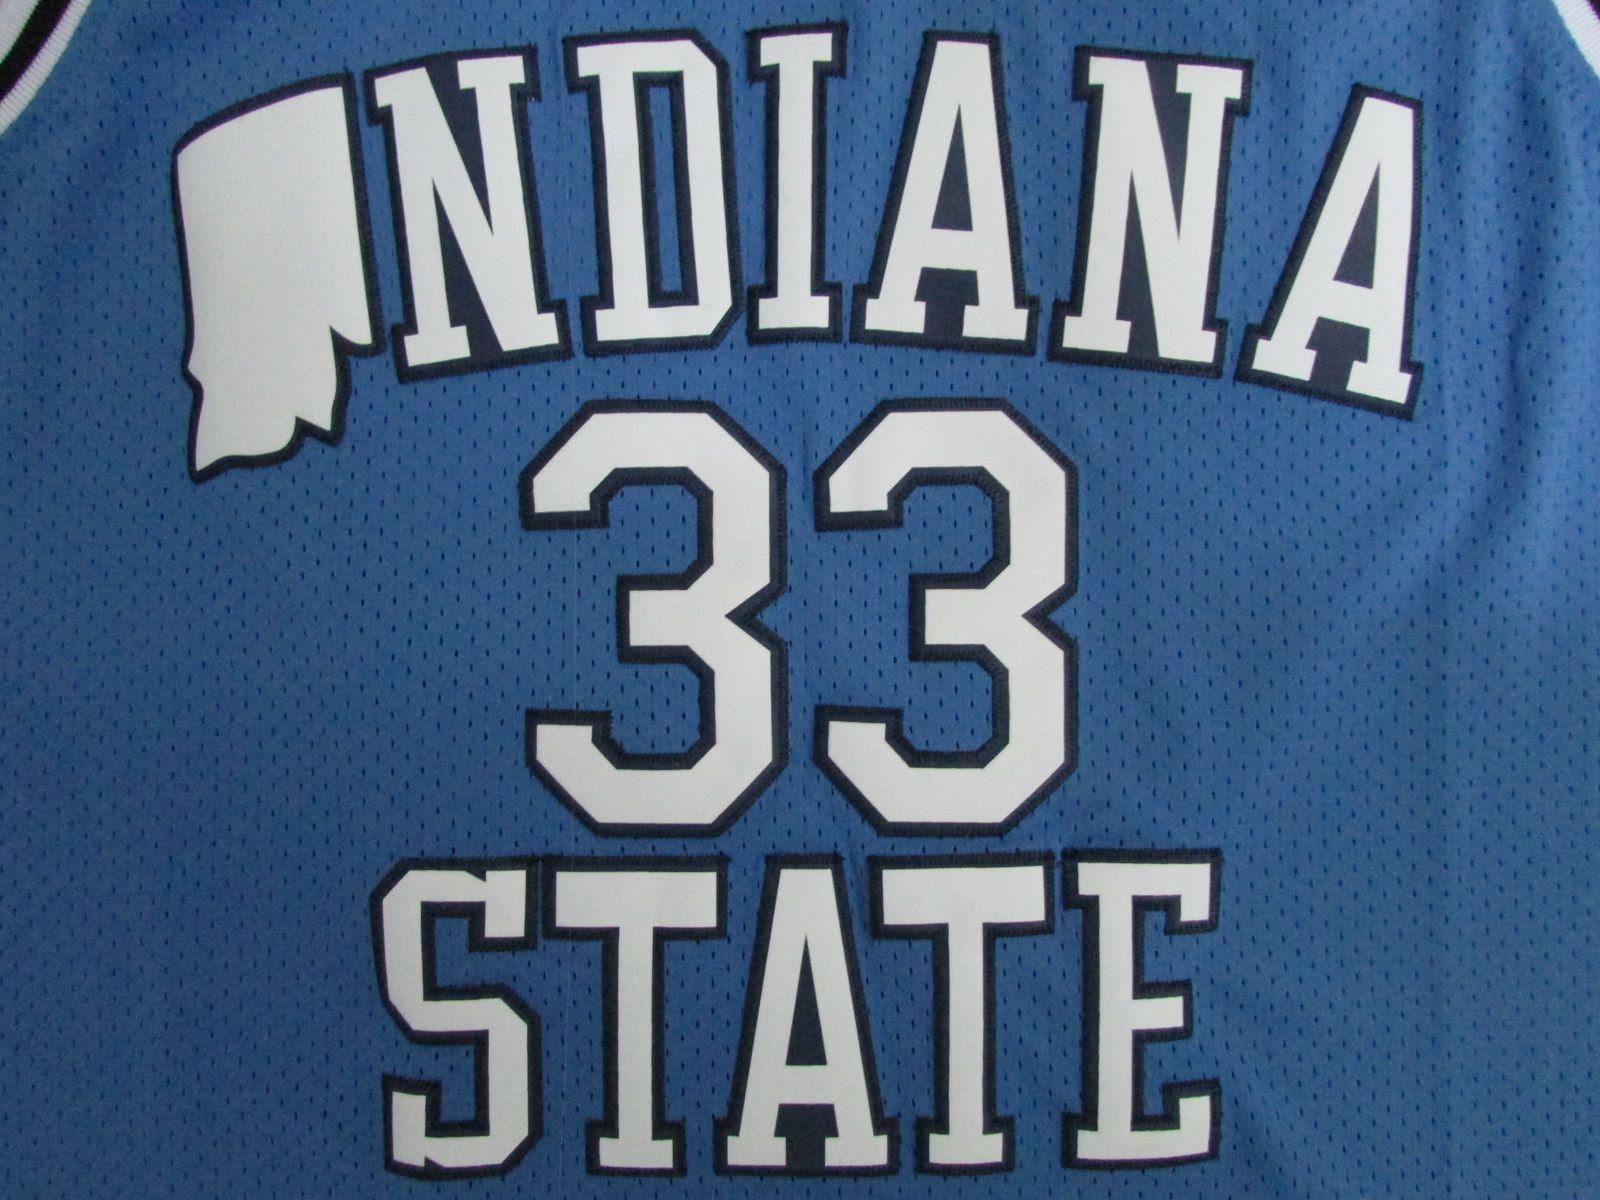 Cheap Men's INDIANA State College #33 Larry Bird Jersey NCAA Stitched 1992 Dream Team USA #7 Bird Basketball Jerseys Drop Shipping Movie